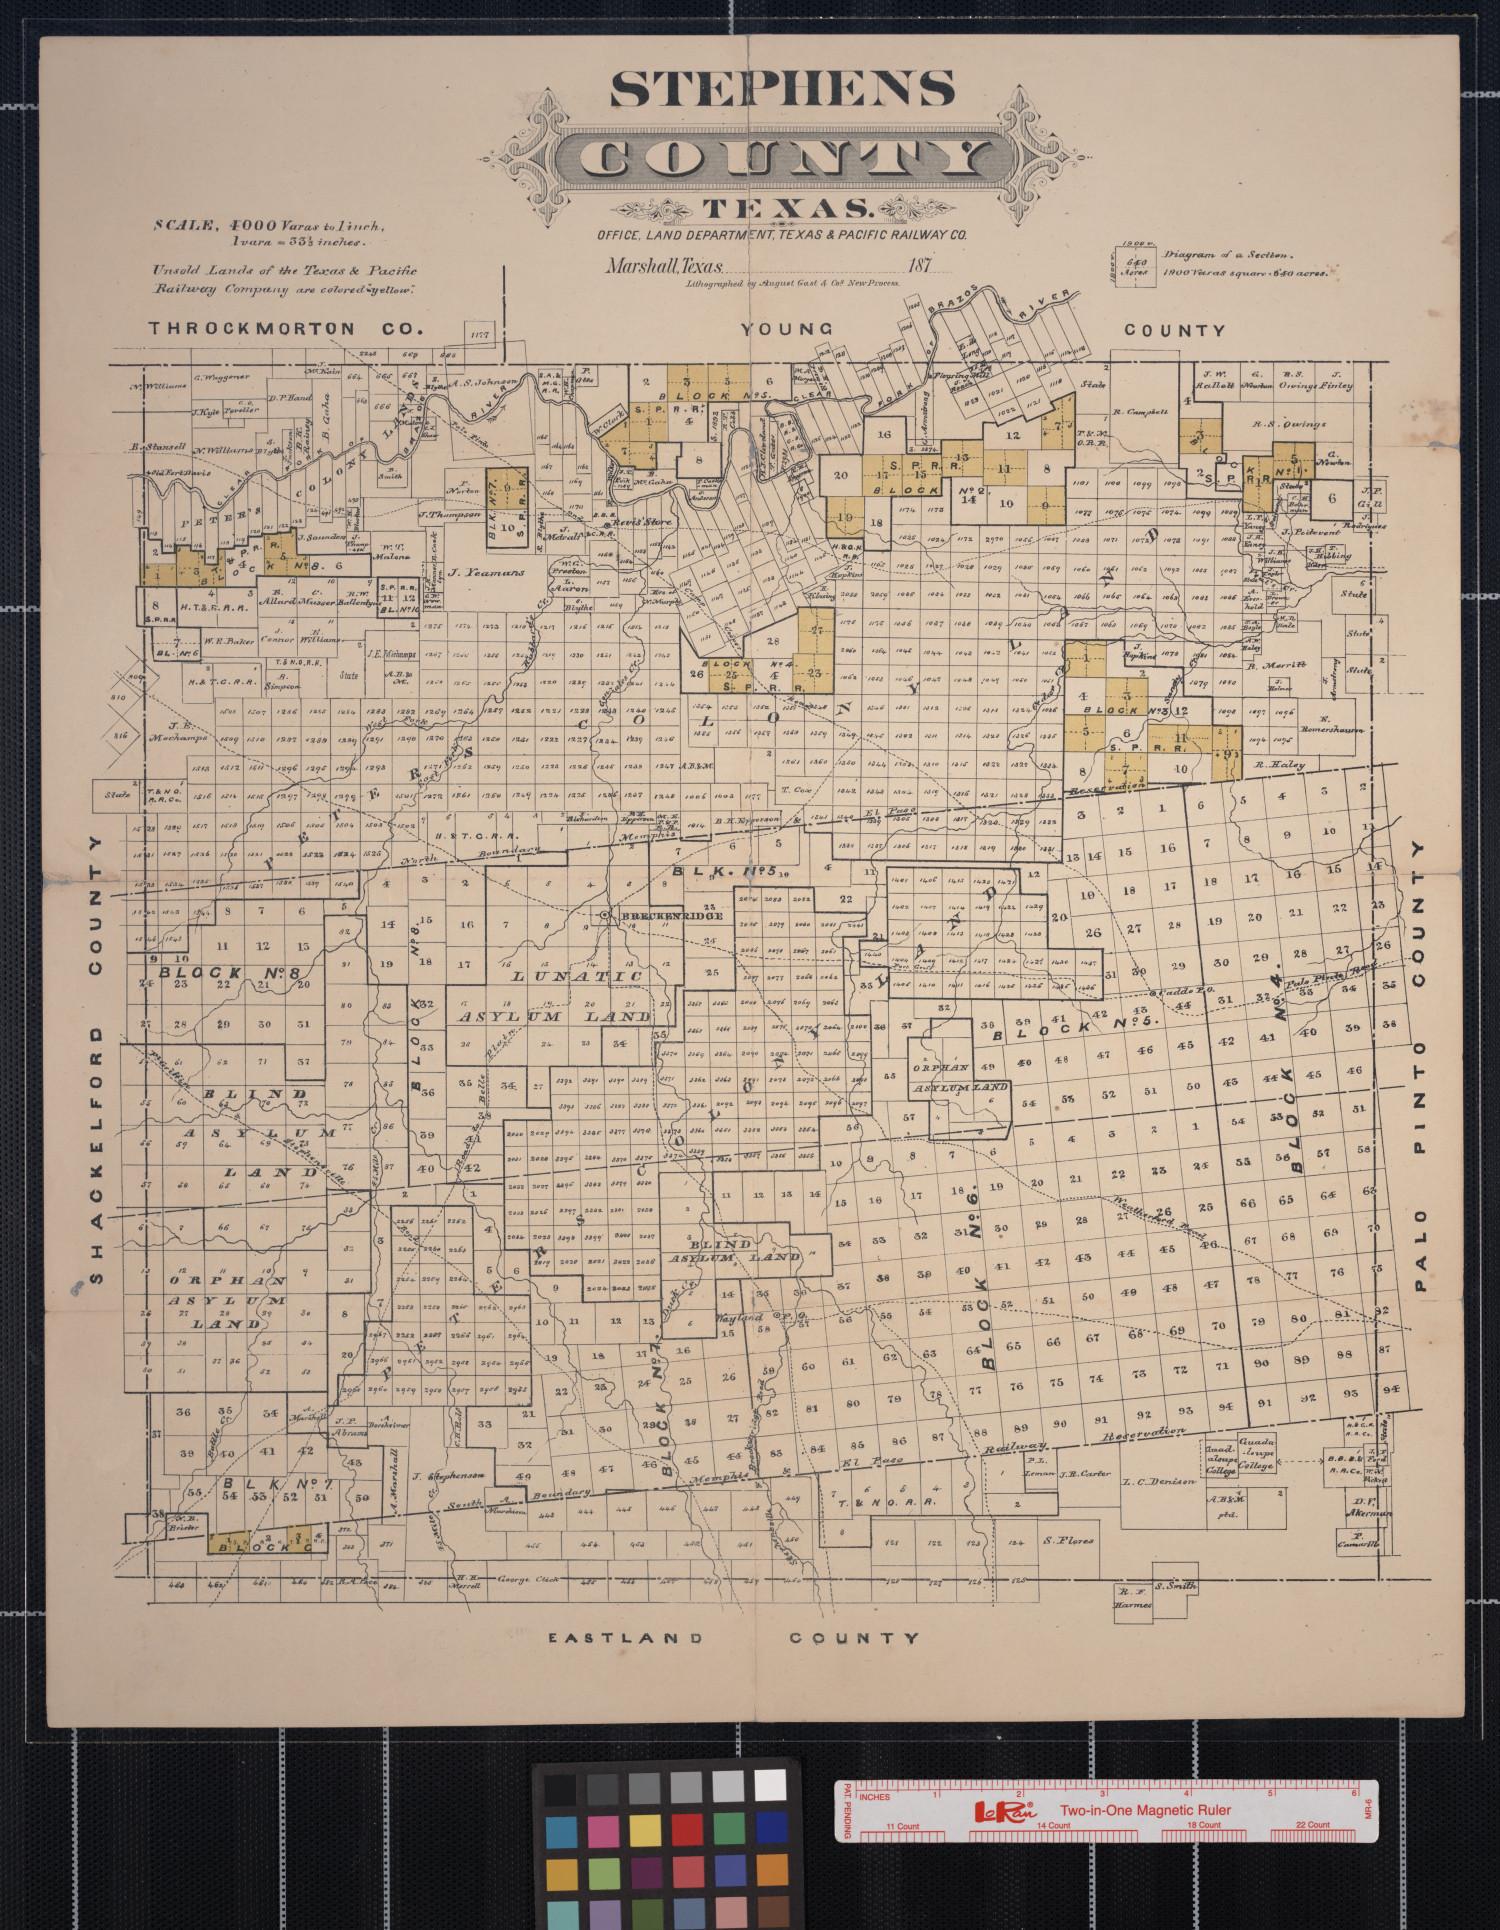 1870 Map Of Texas.Stephens County Texas The Portal To Texas History